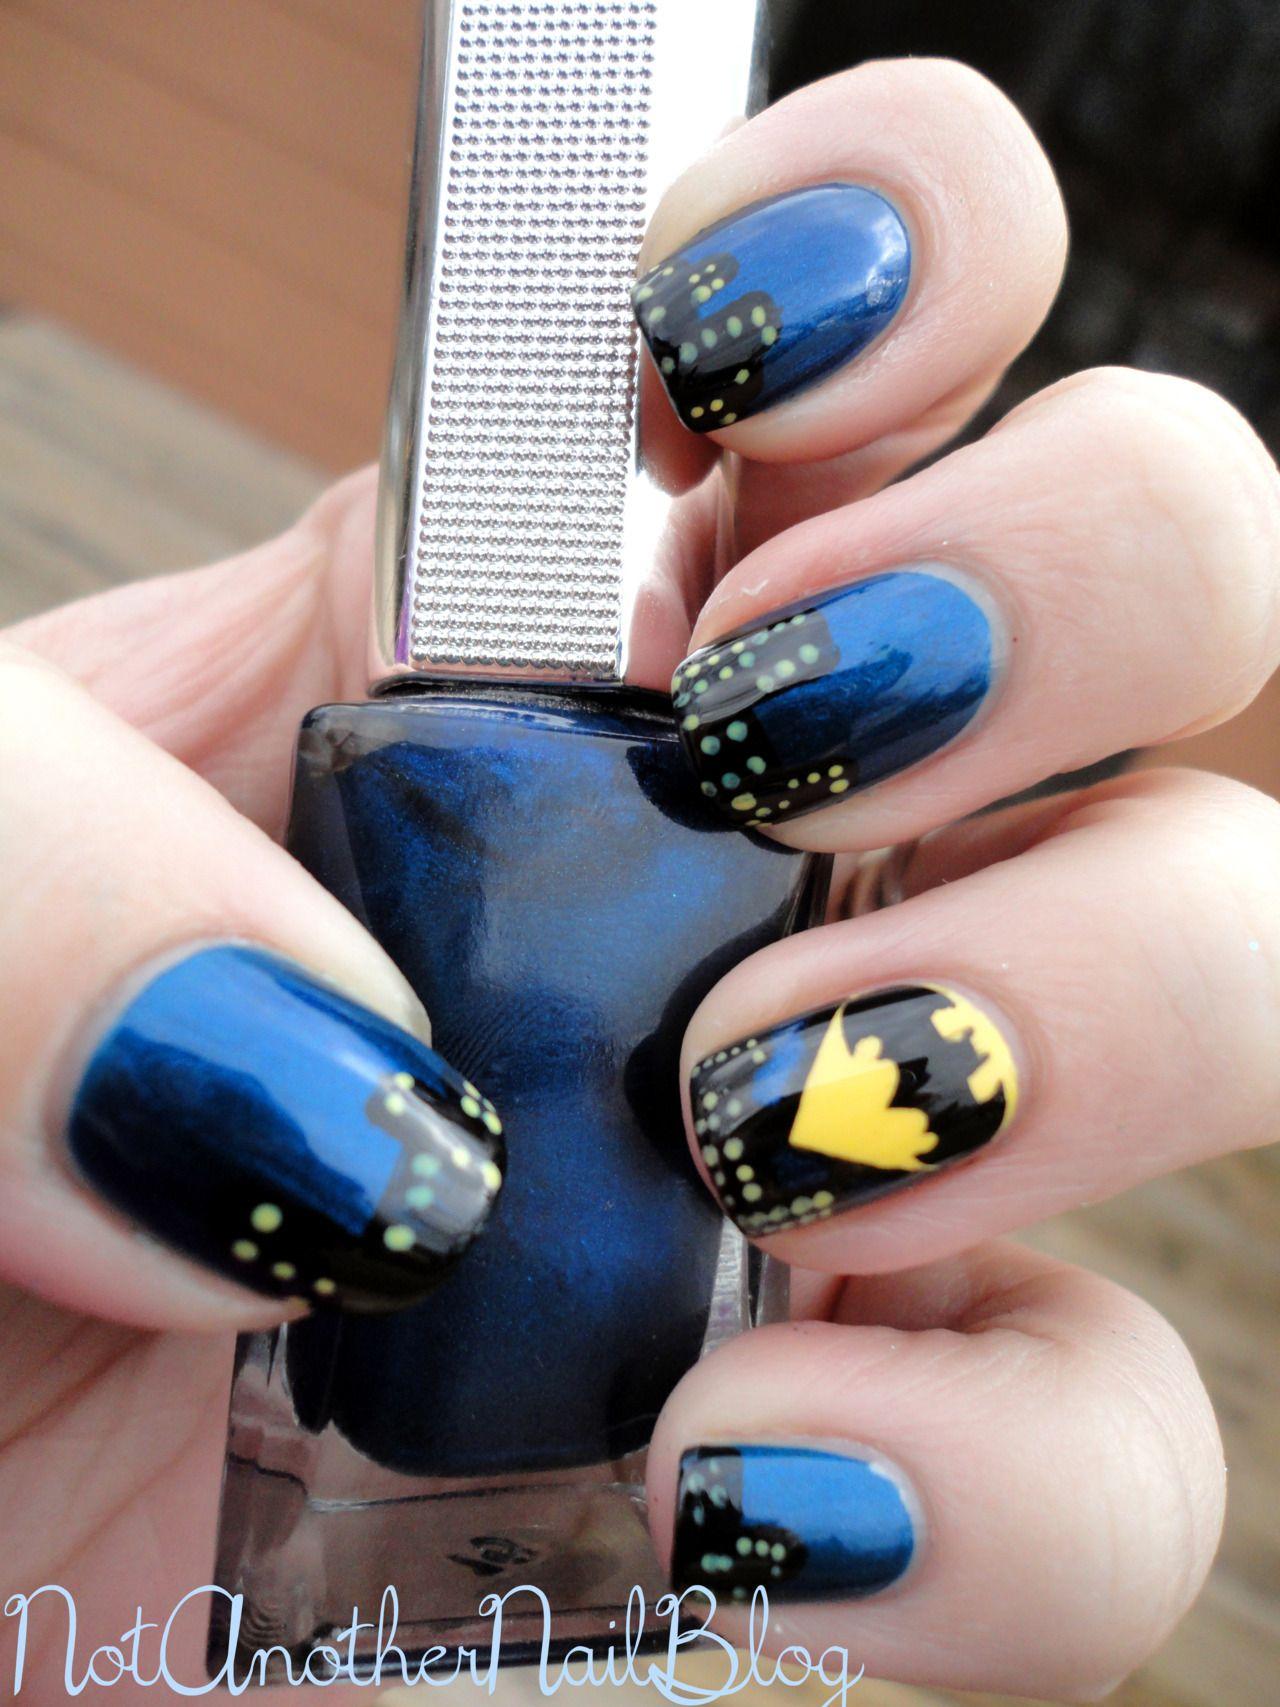 Batman Nails!! NANANANANANANANA BATMAN nails!!